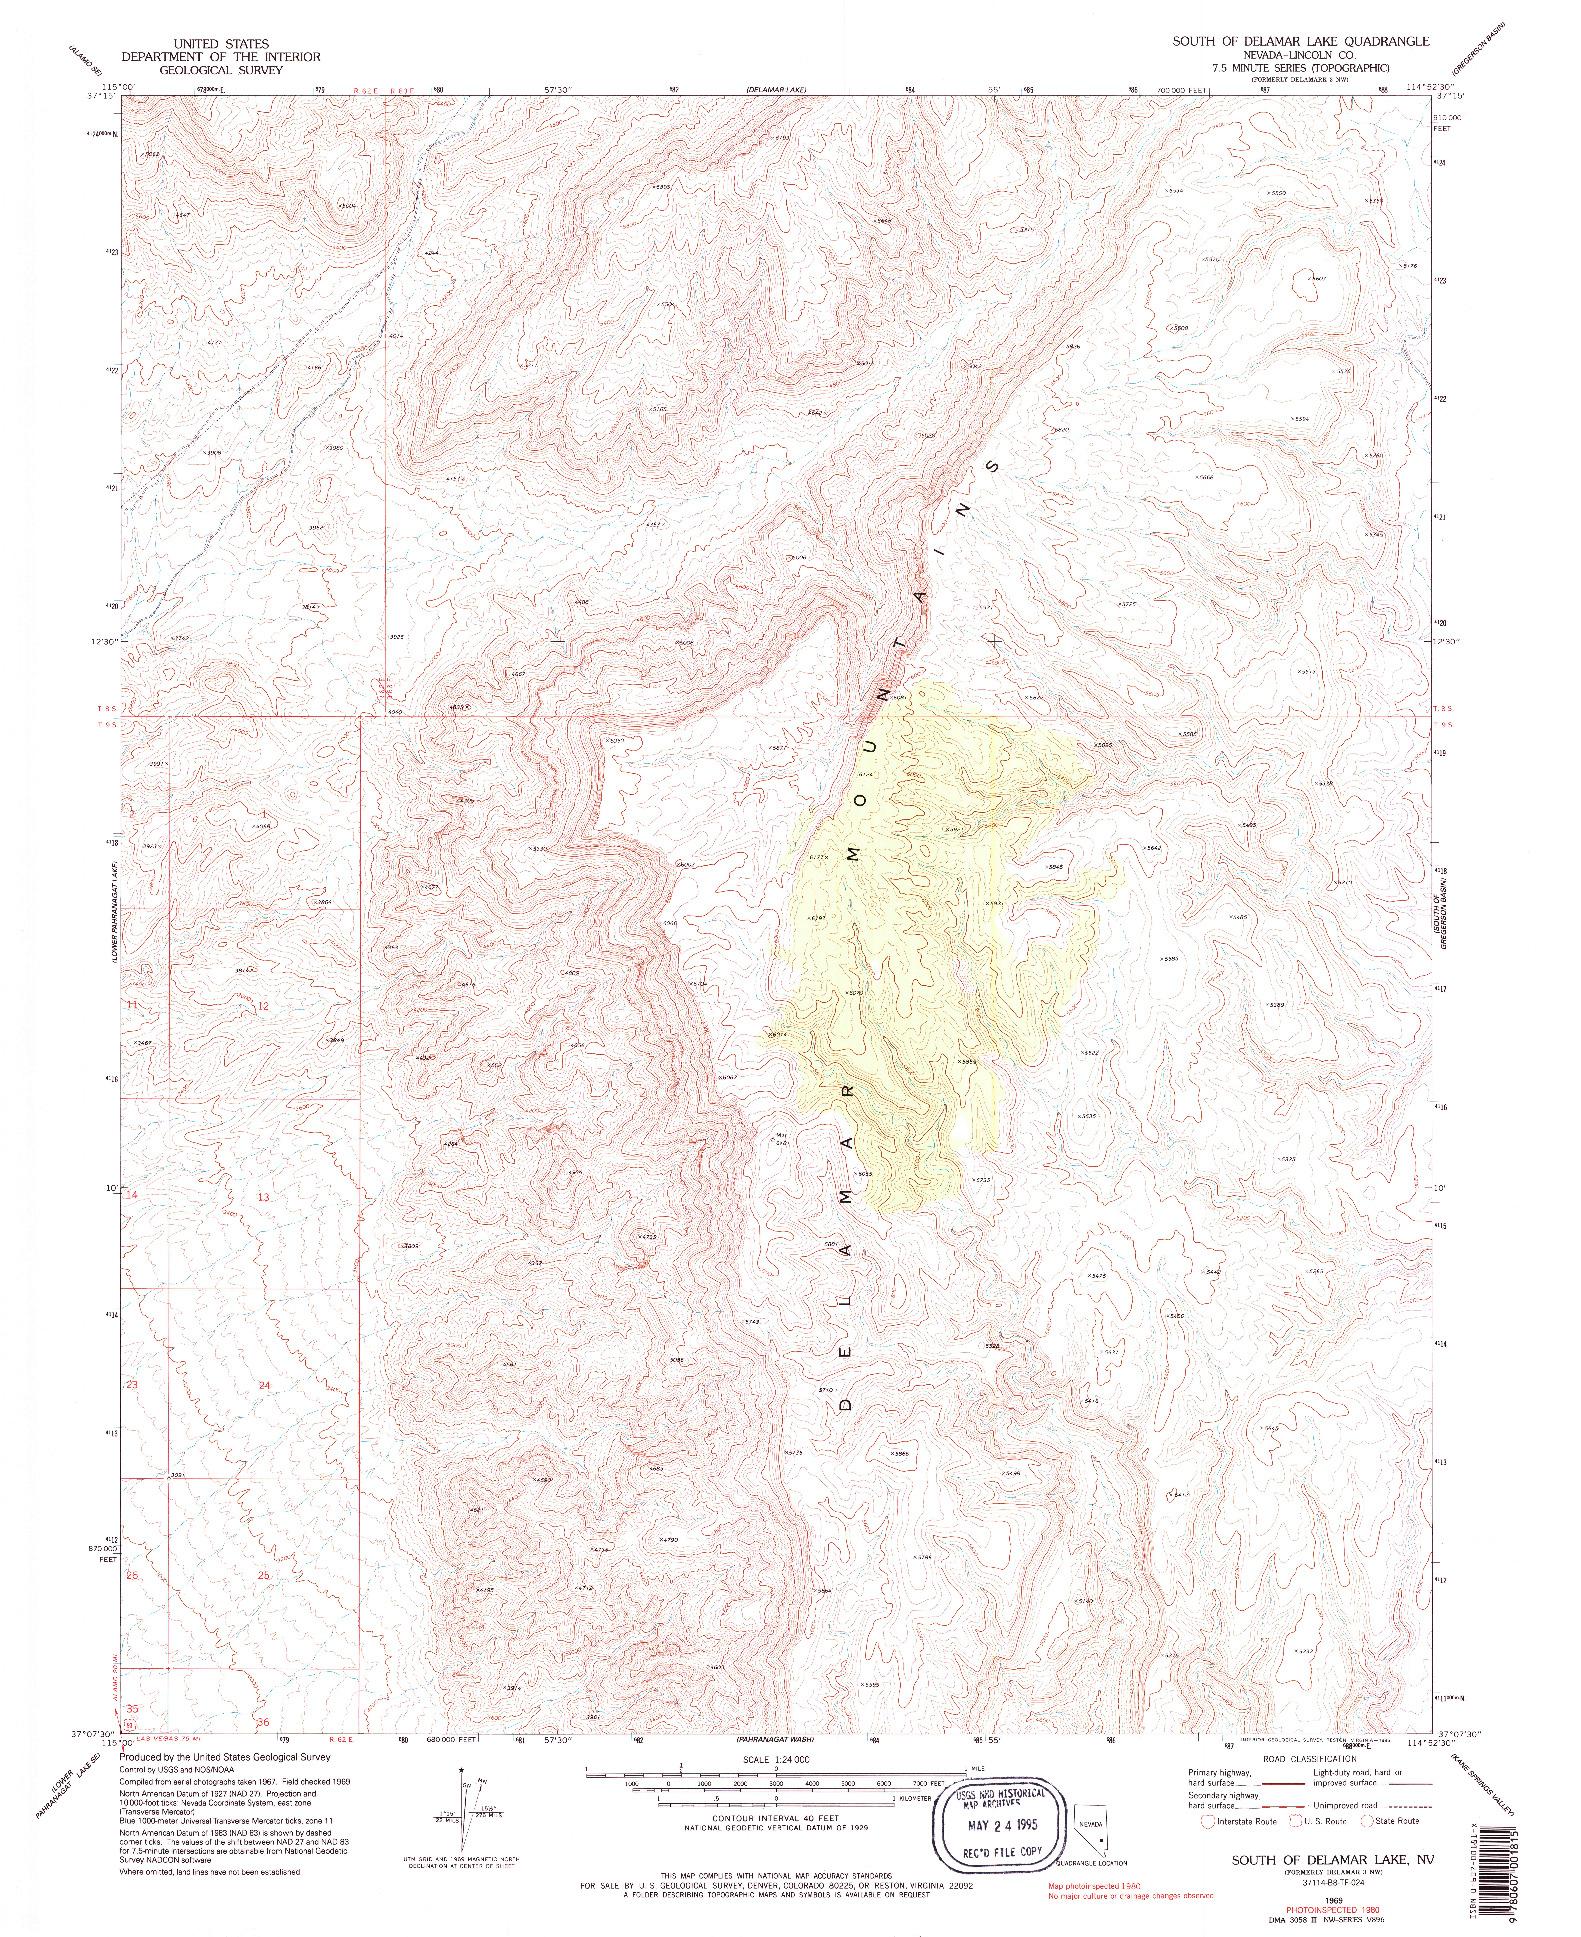 USGS 1:24000-SCALE QUADRANGLE FOR SOUTH OF DELAMAR LAKE, NV 1969